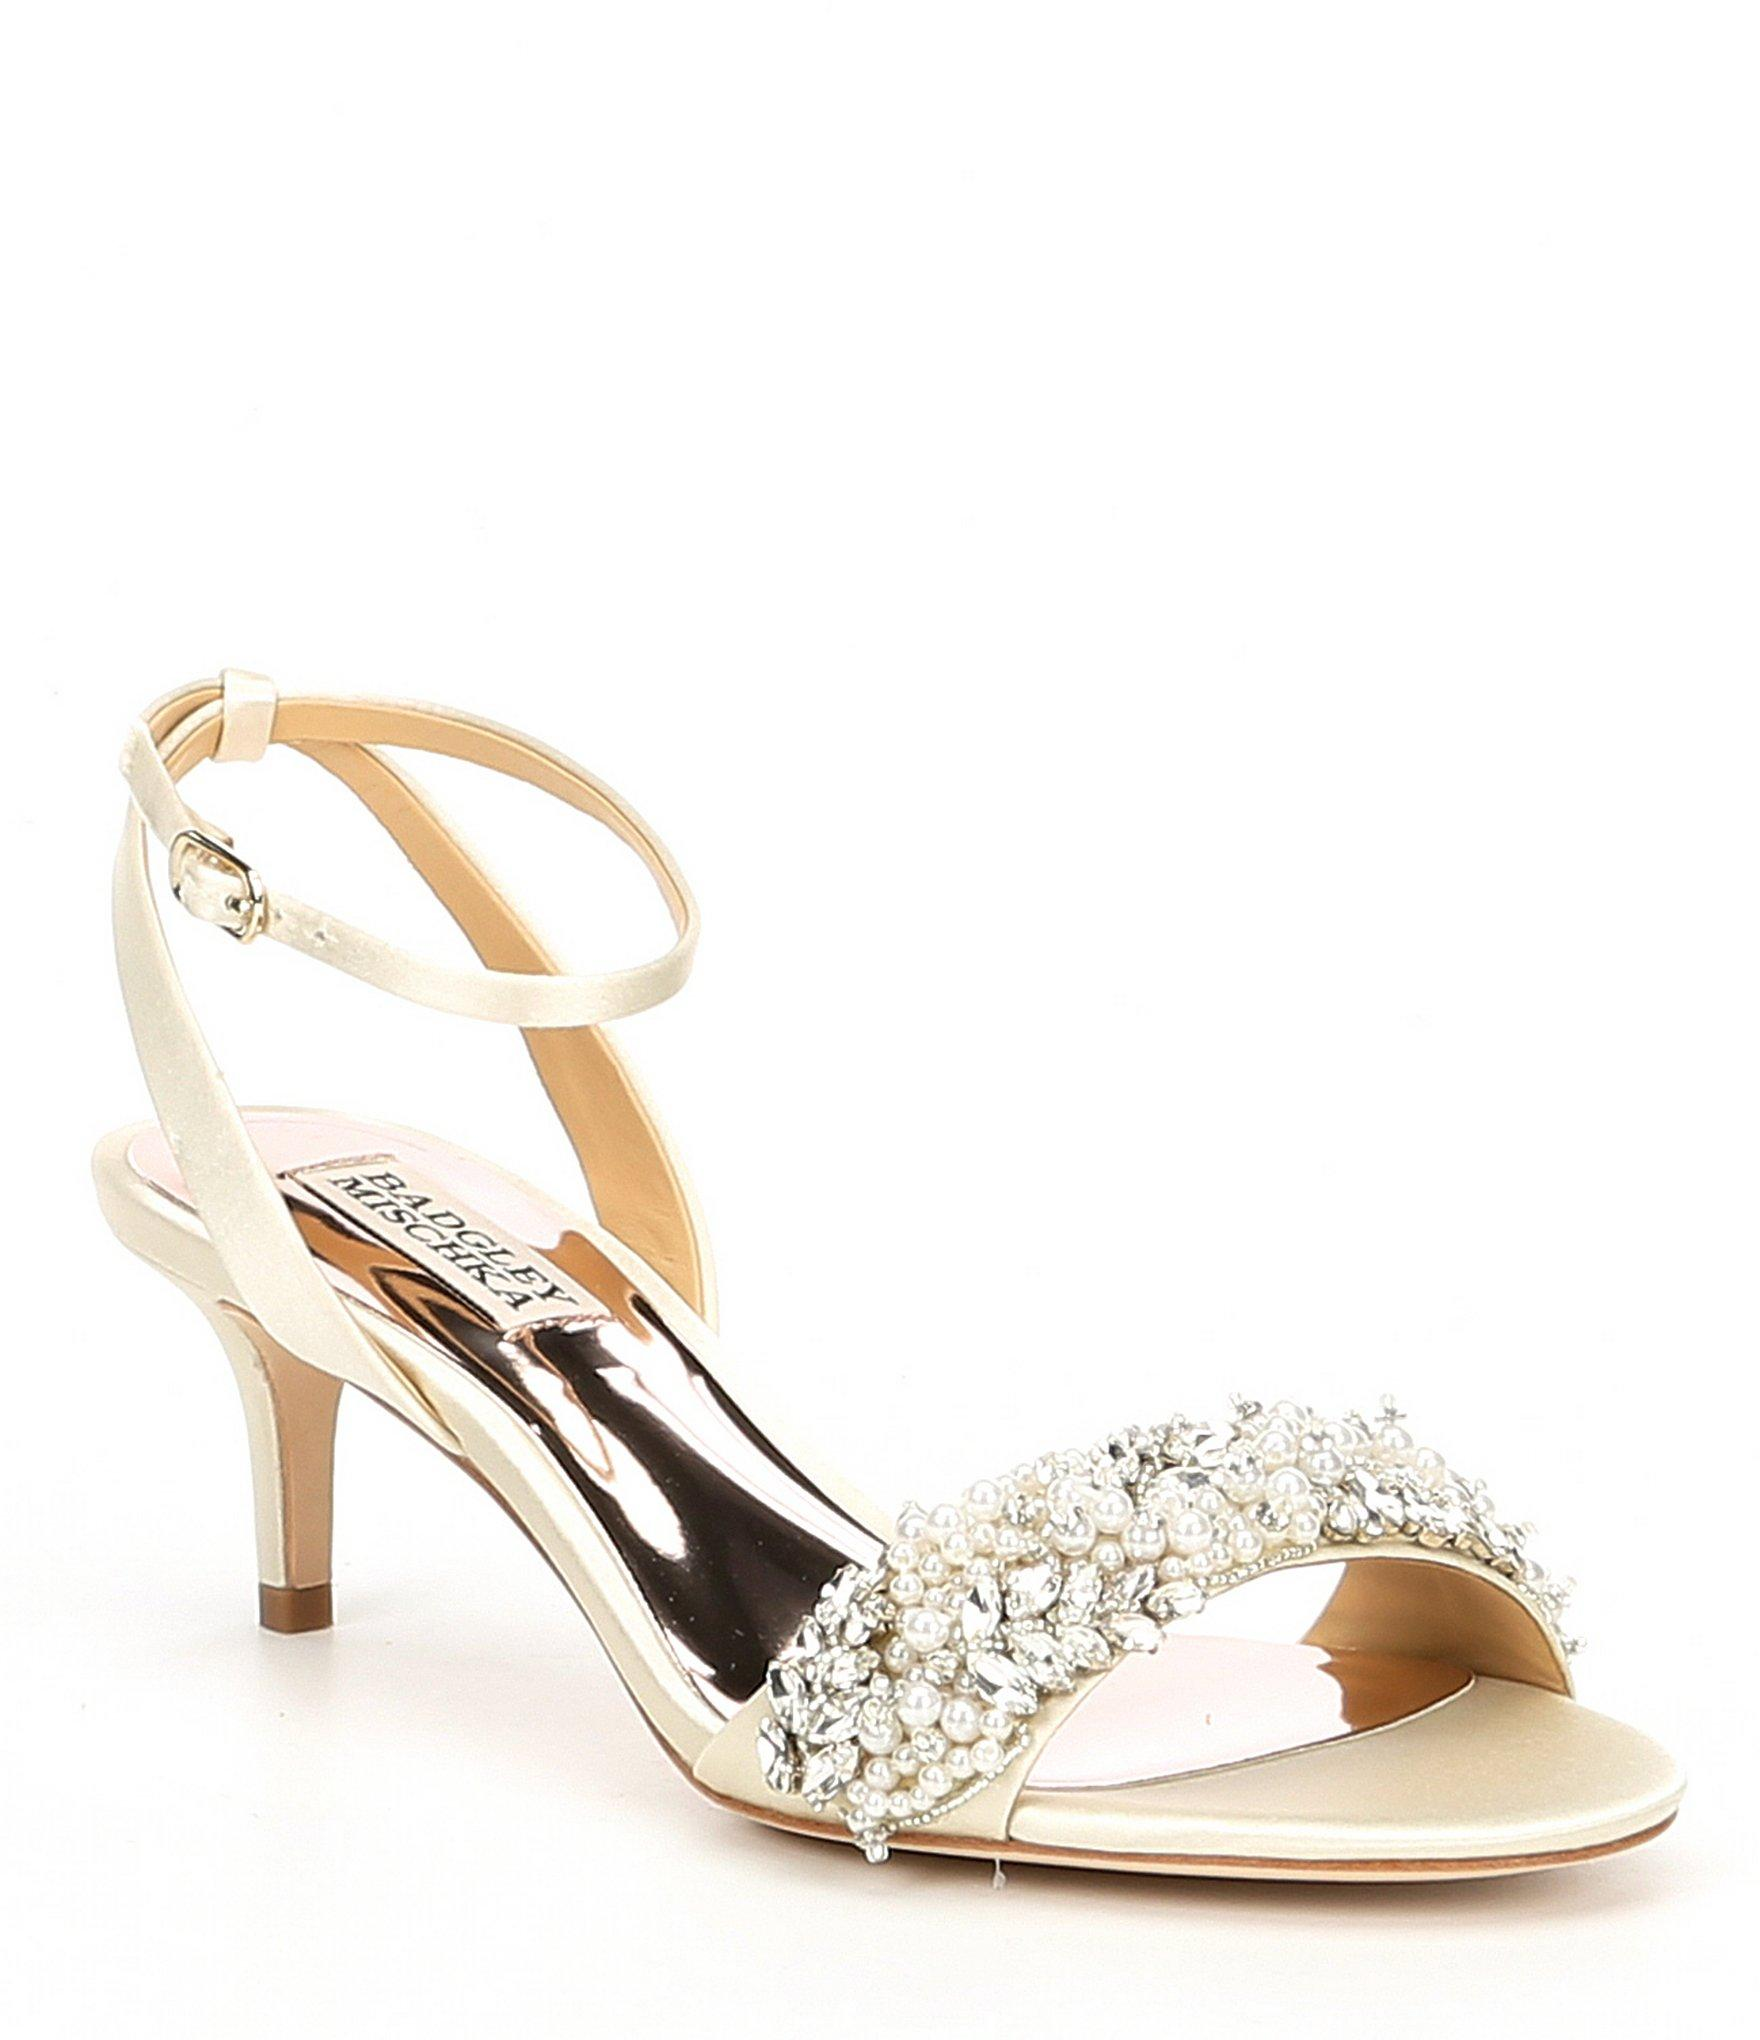 9079968de2a Lyst - Badgley Mischka Fiona Satin Pearls Kitten Heels in White